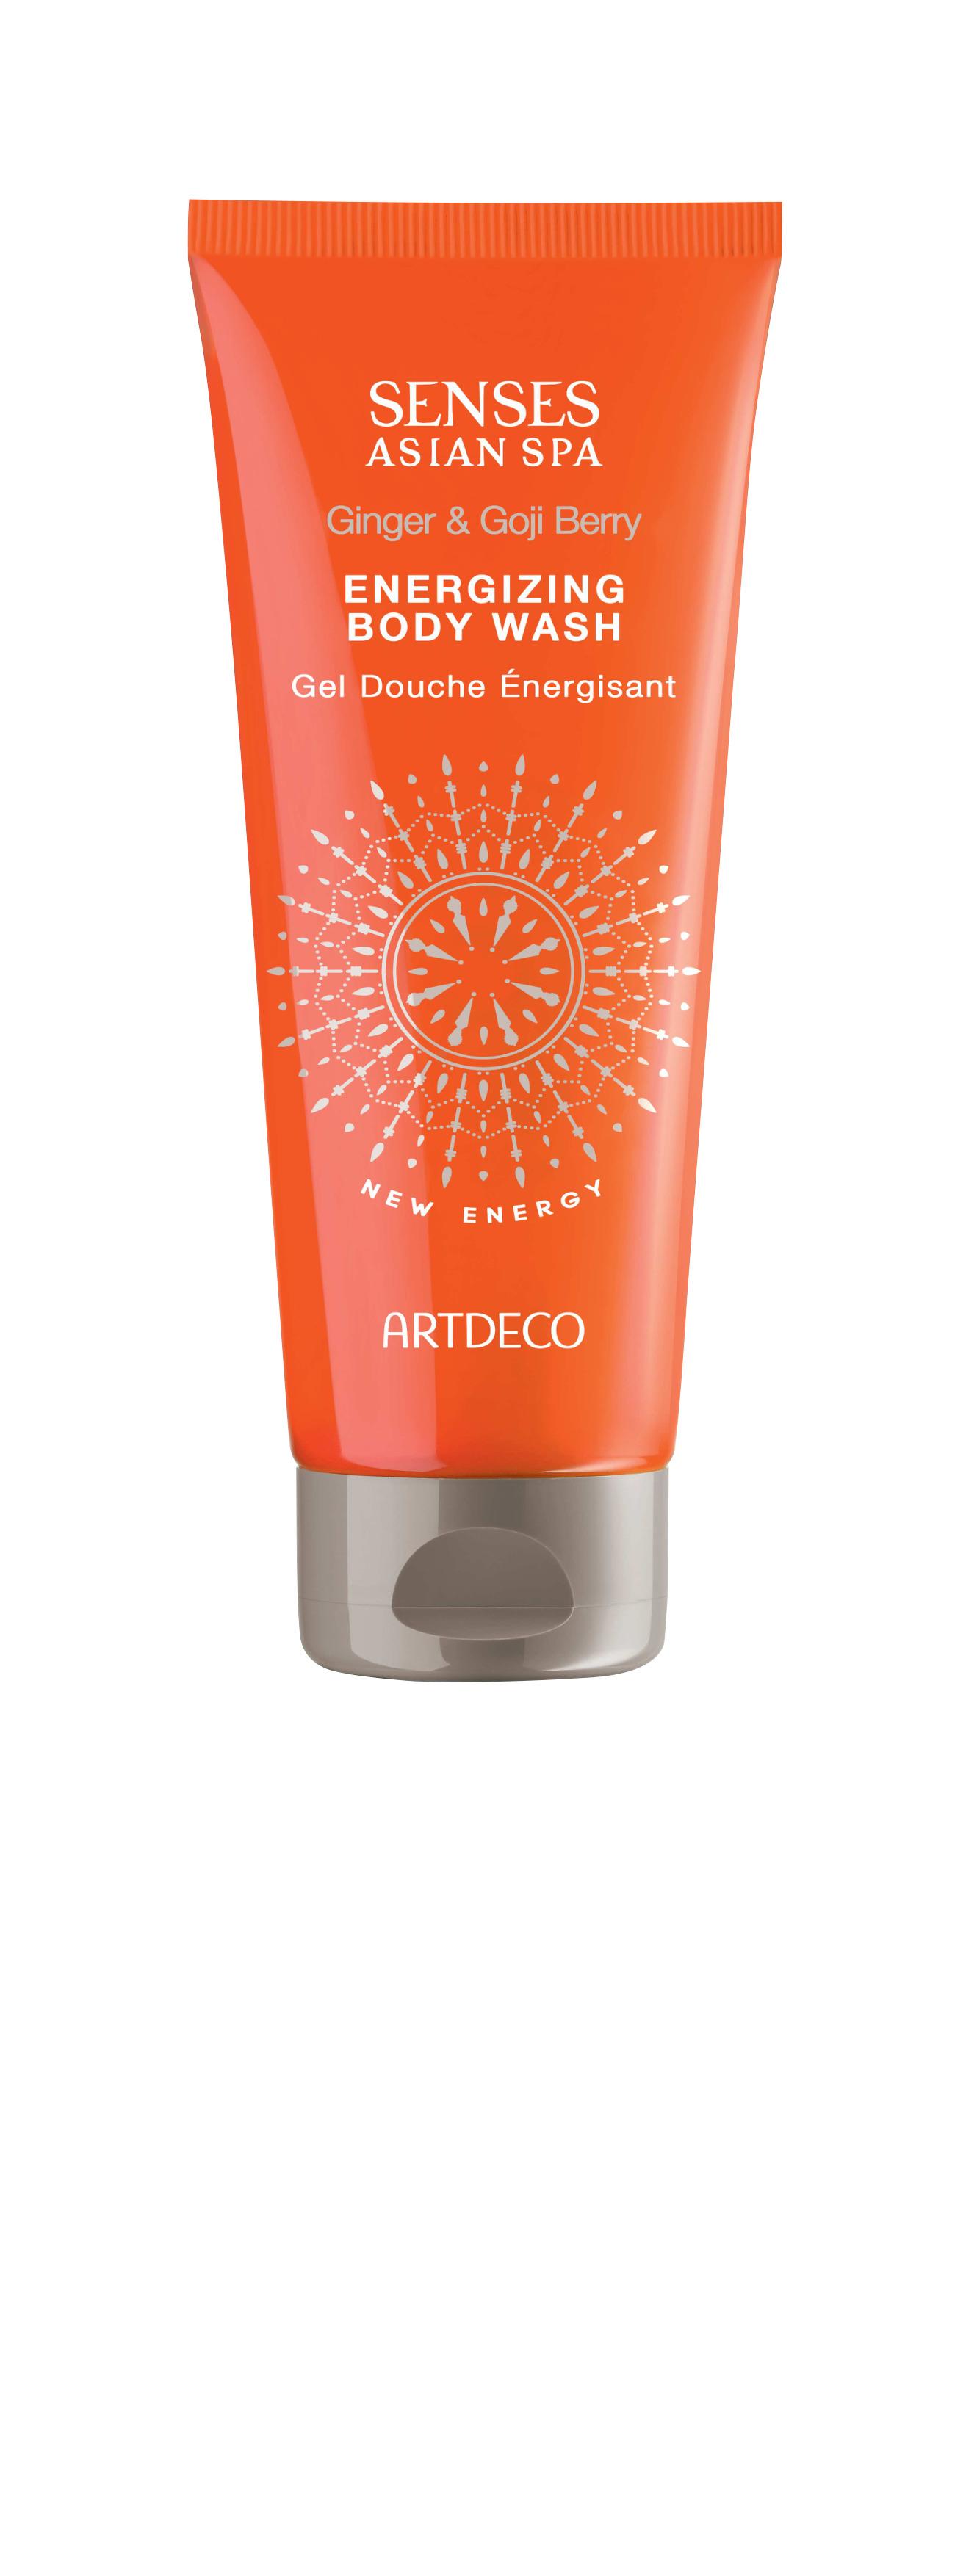 Artdeco гель для душа тонизирующий Energizing body wash, new energy, 200 млБ33041Легкая бодрящая текстура Яркий аромат